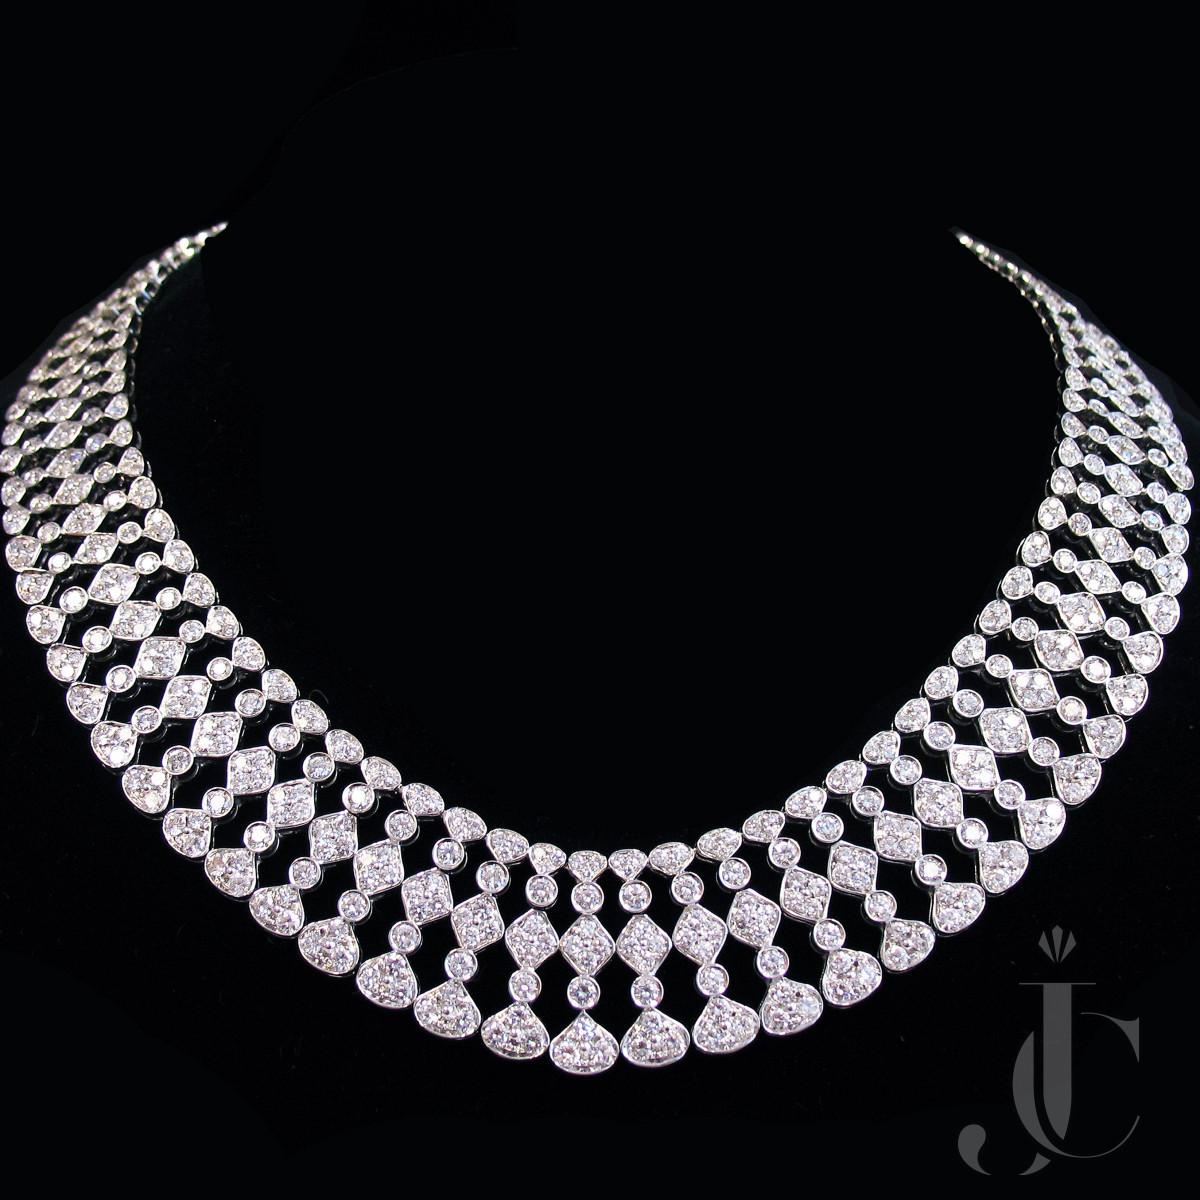 H. Stern  Lace 18 Kt White Gold Diamonds Necklace